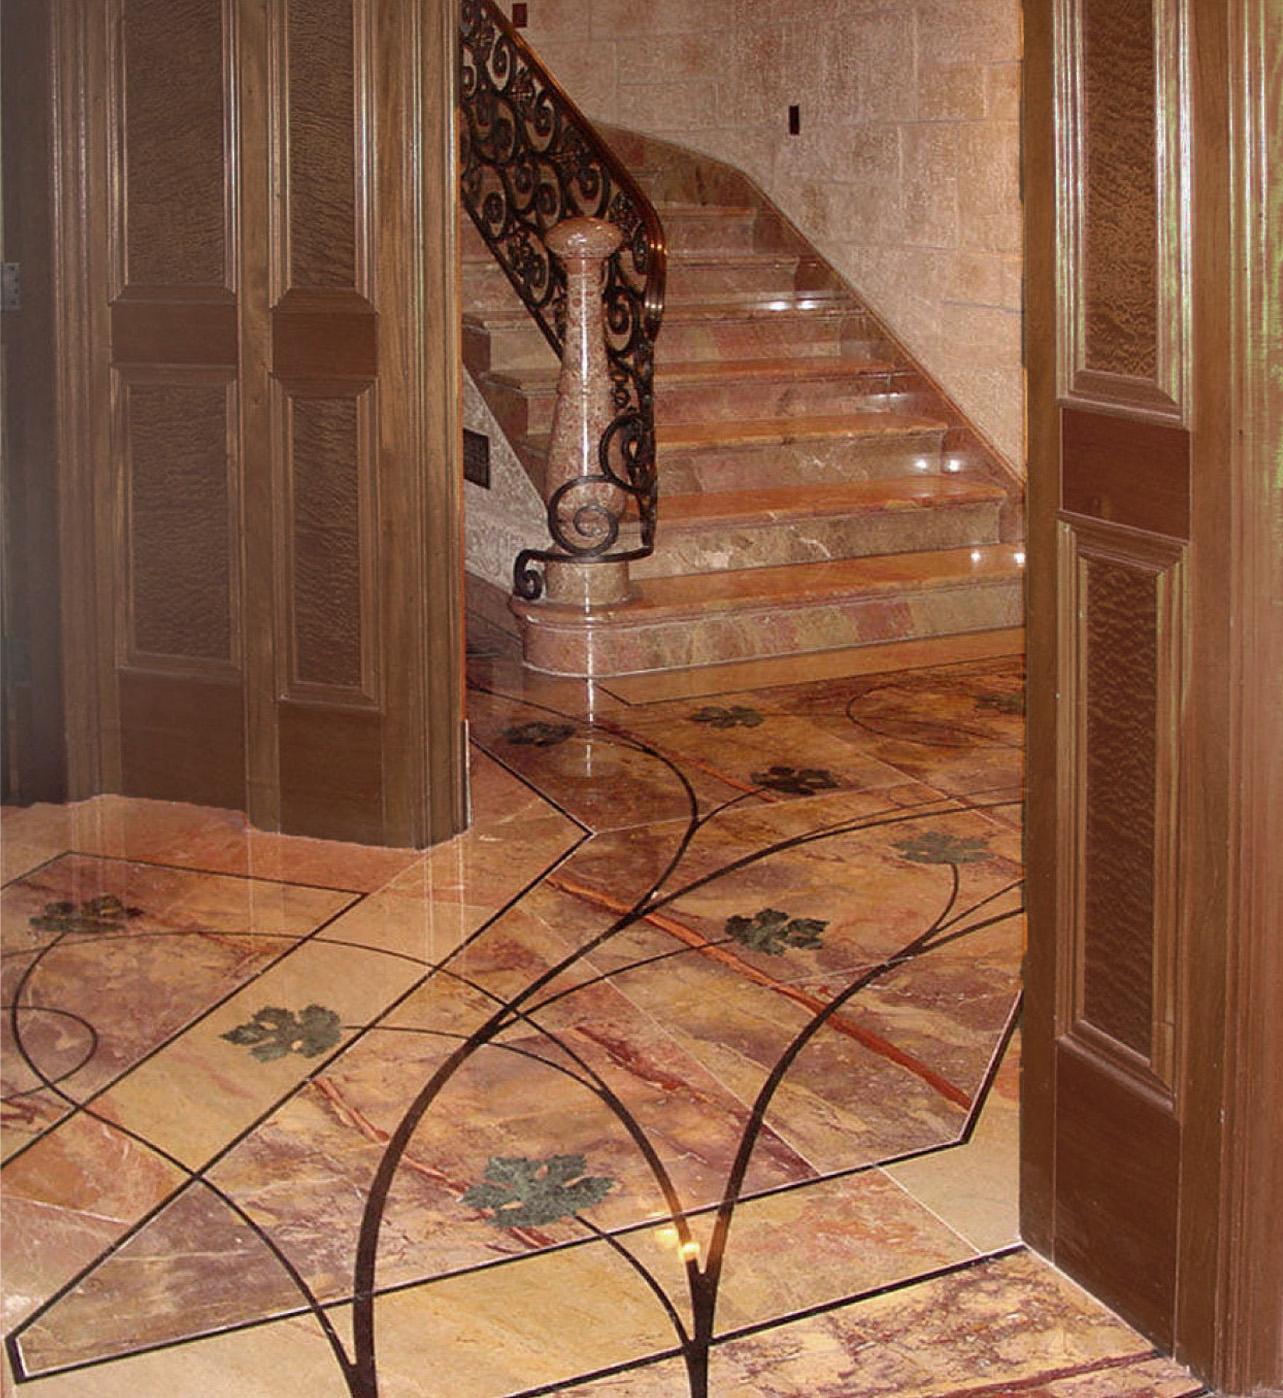 pietra dura marble floor